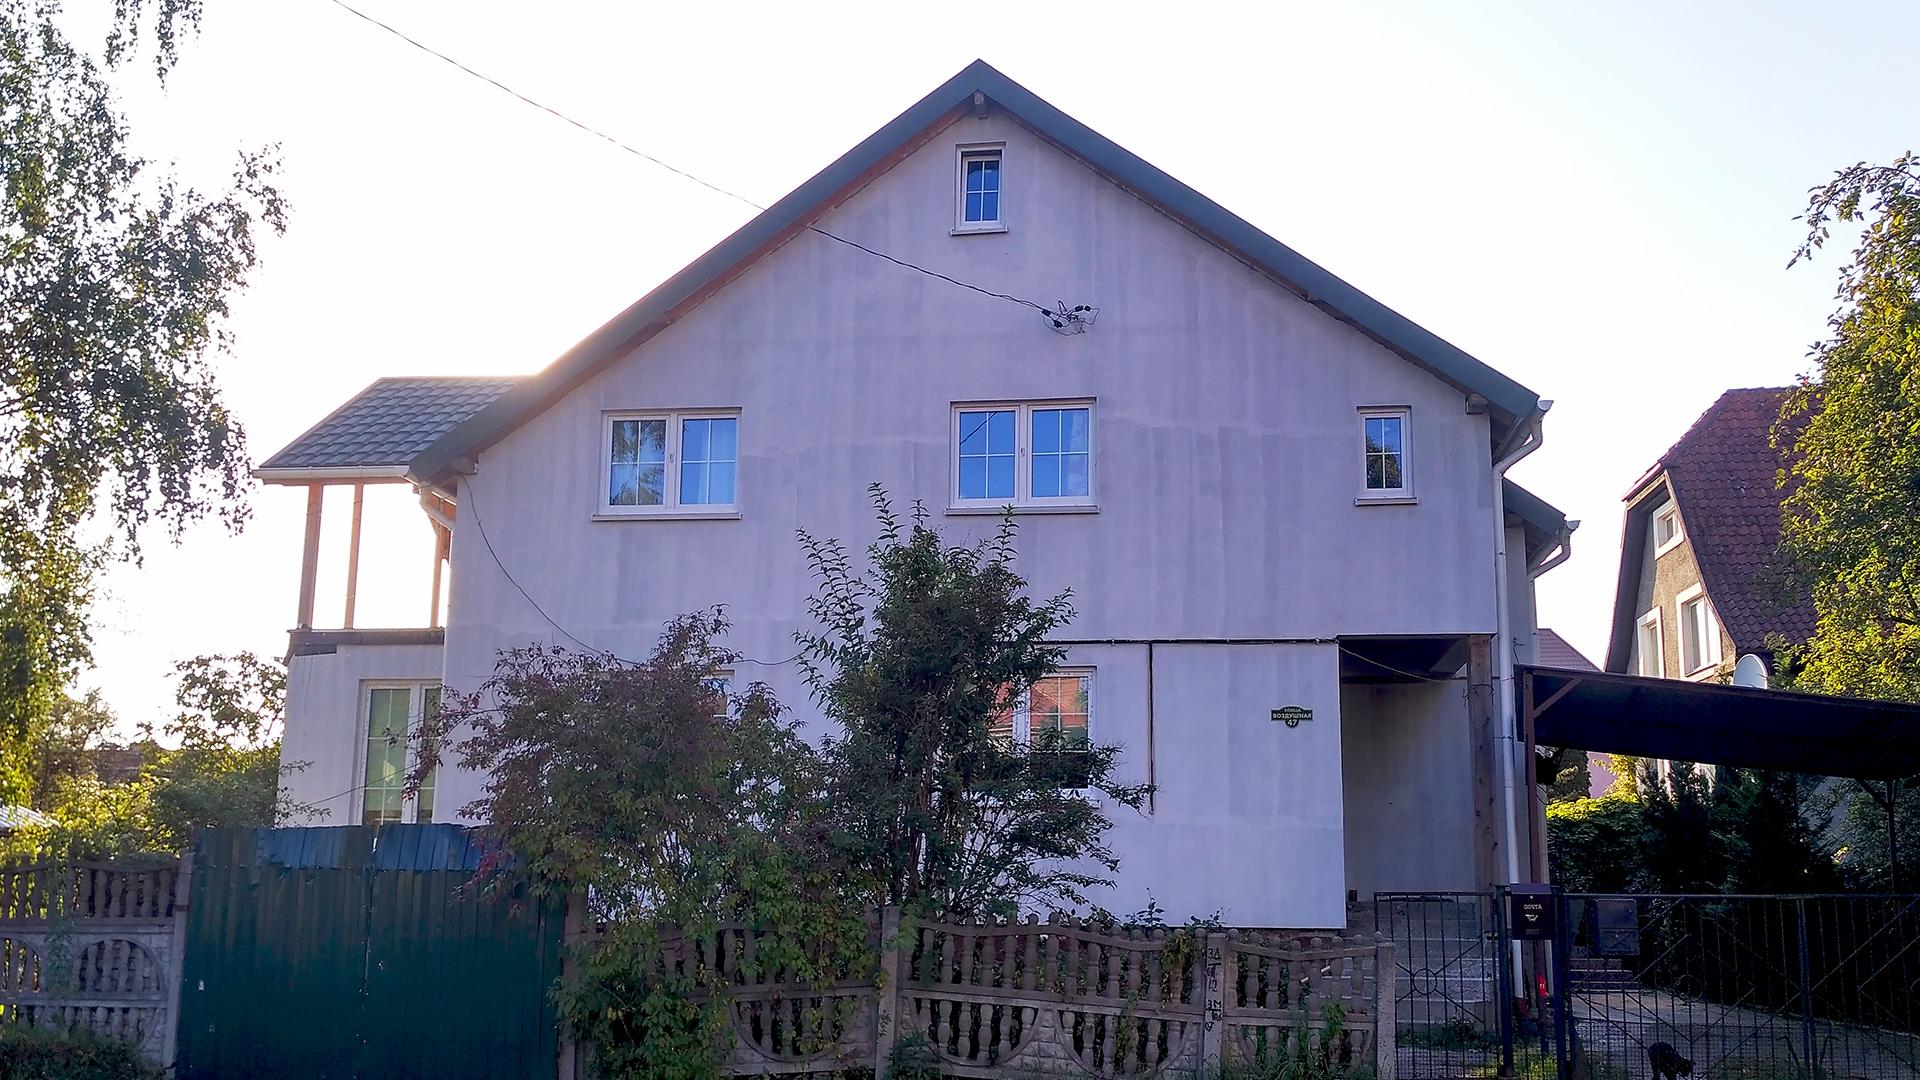 rekonstrukciya-doma-sip-kanadskie-doma_13